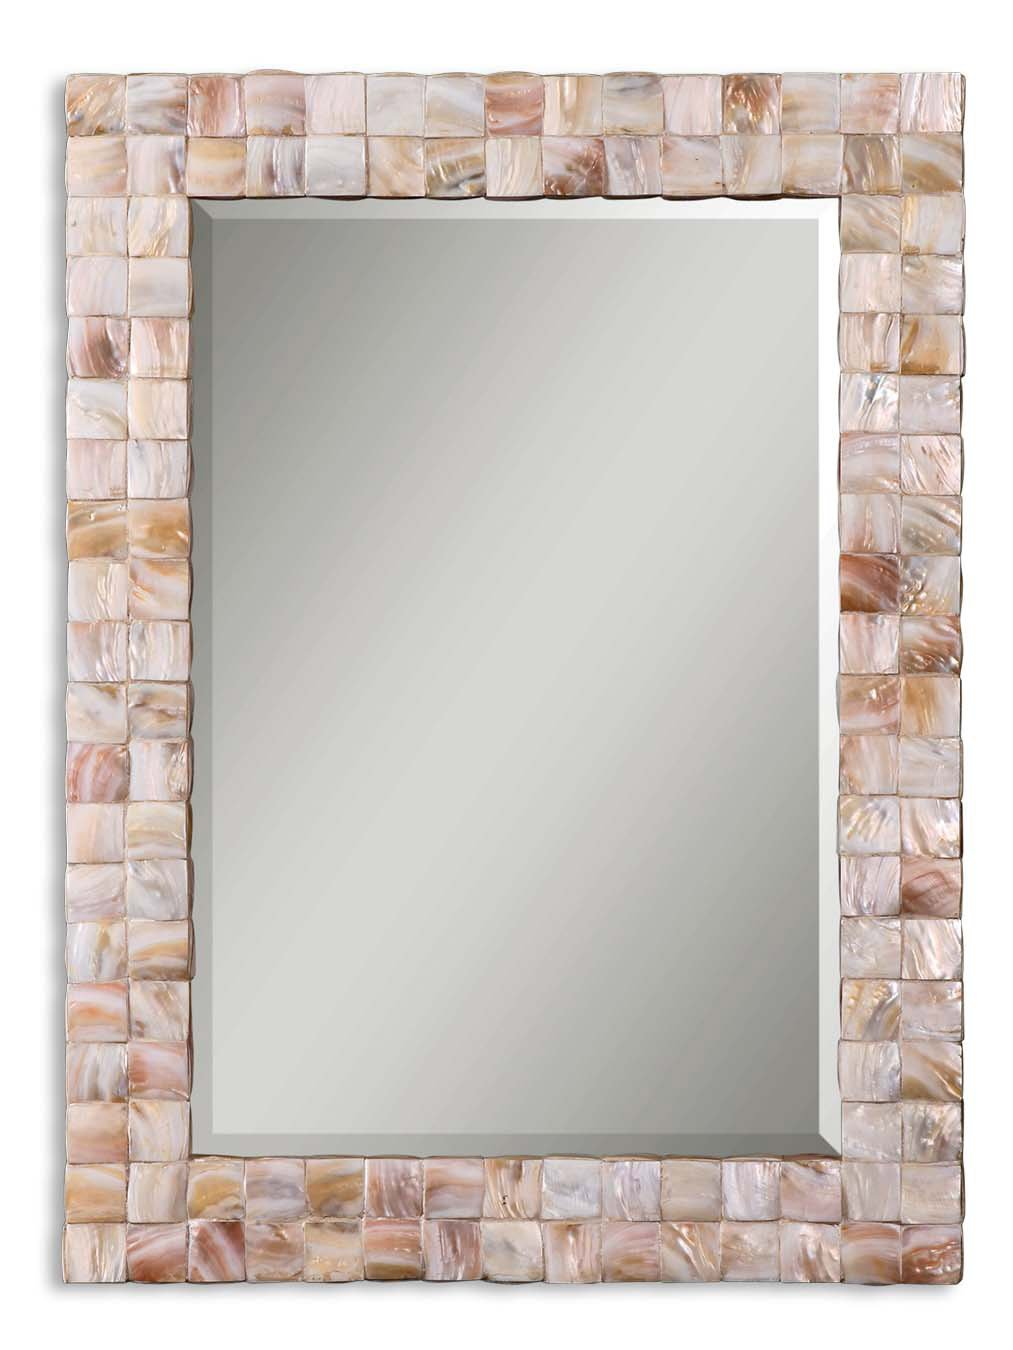 Amazon.com: Uttermost Vivian Mirror: Home & Kitchen